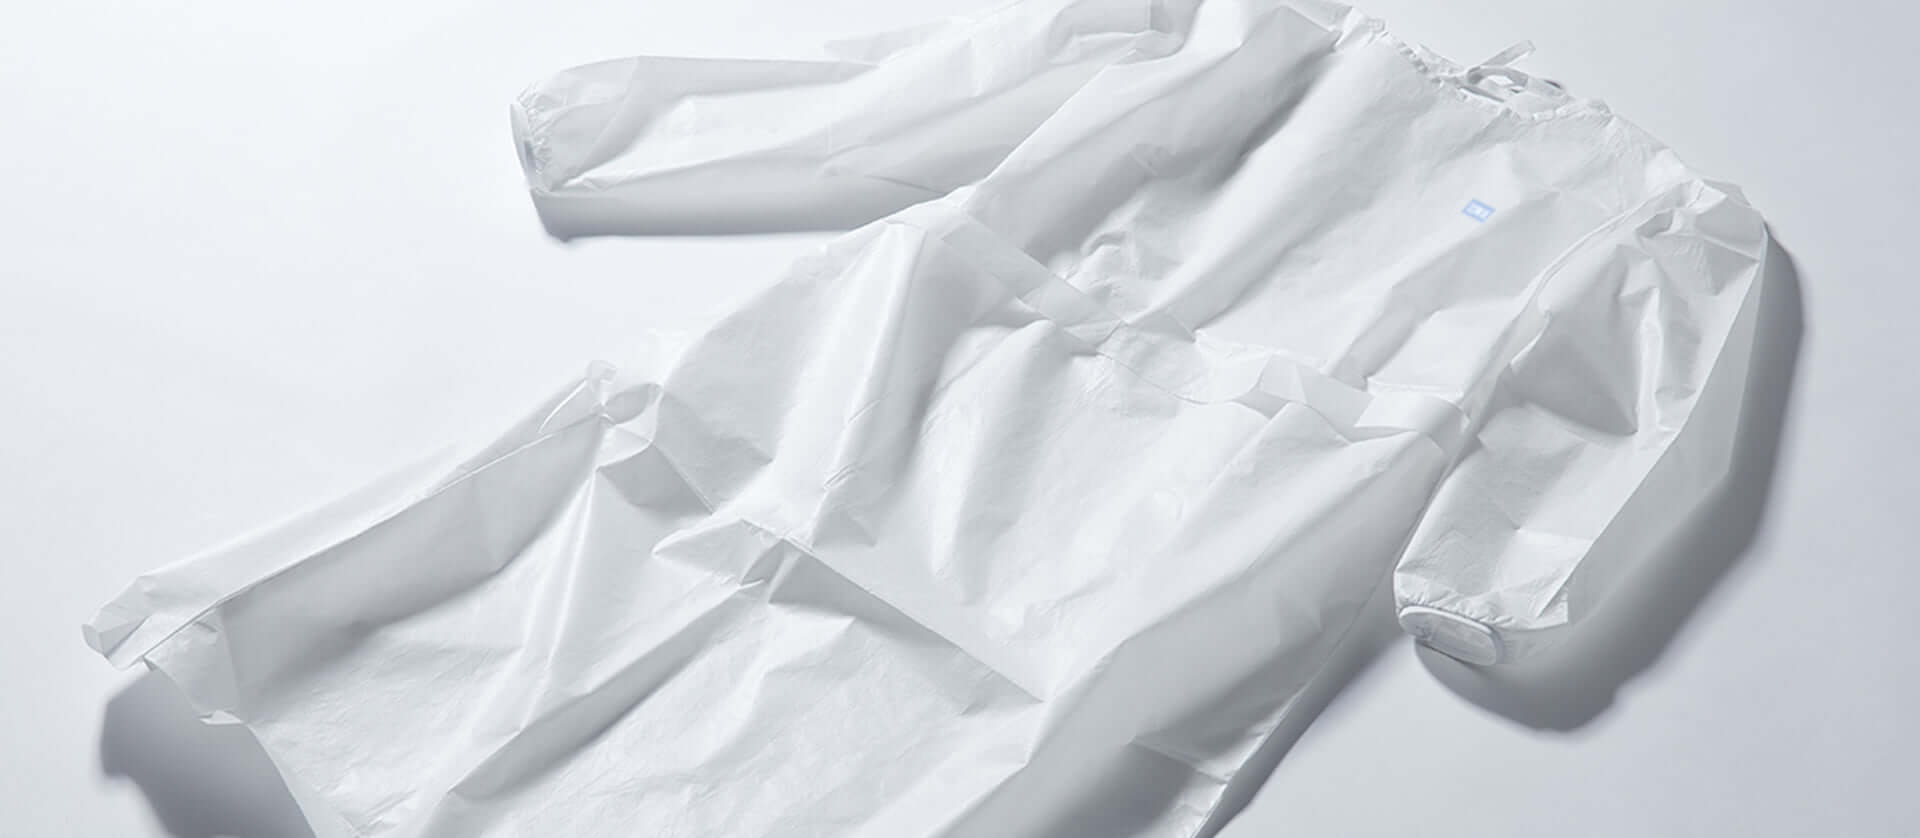 EDWINがアイソレーションガウンを自社縫製工場にて生産開始&オンライン販売もスタート! lf200722_edwin_14-1920x838